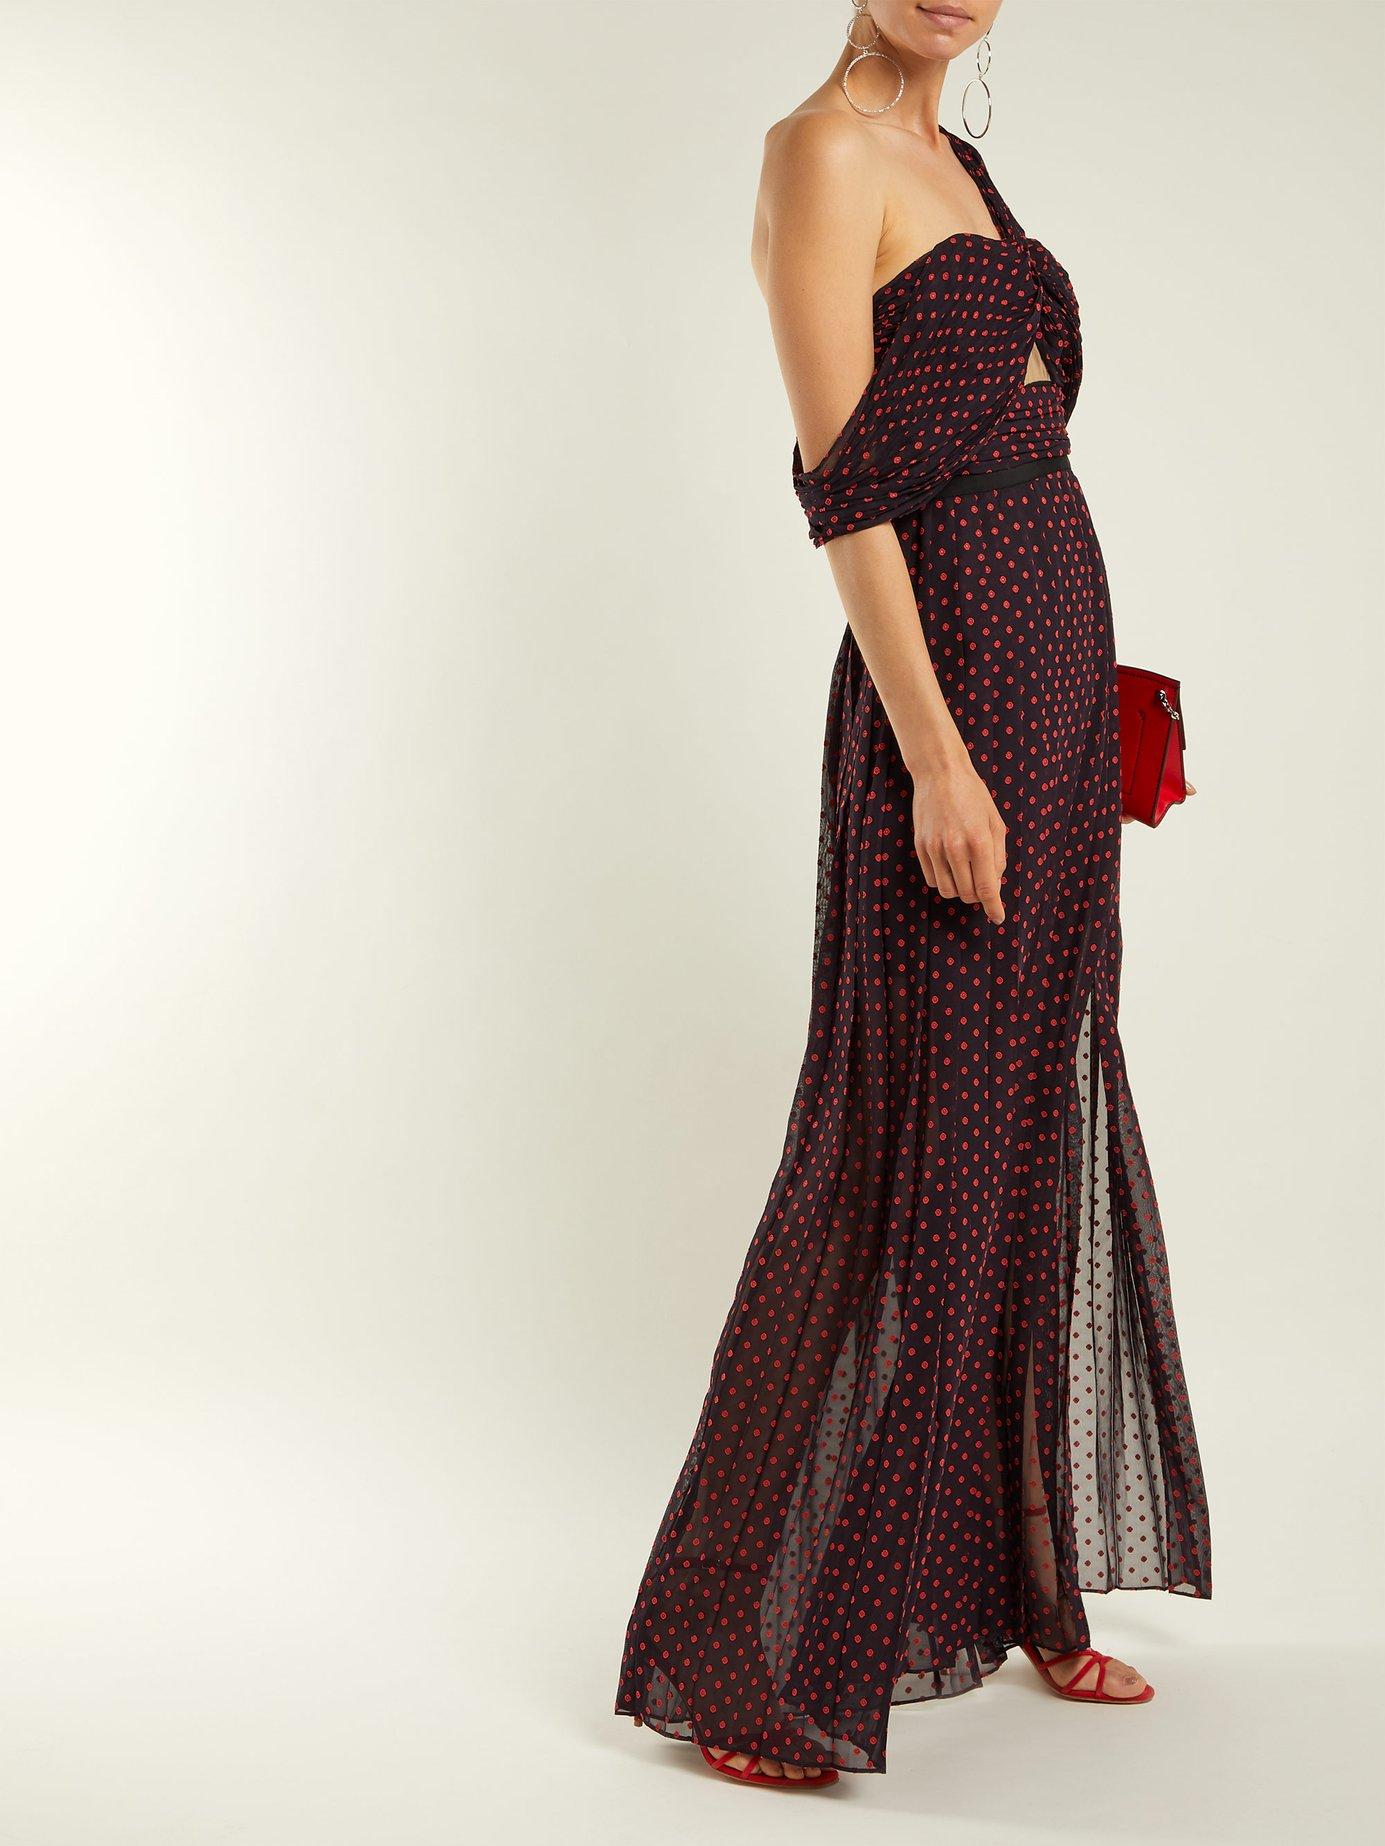 Polka-dot print one-shoulder maxi dress by Self-Portrait